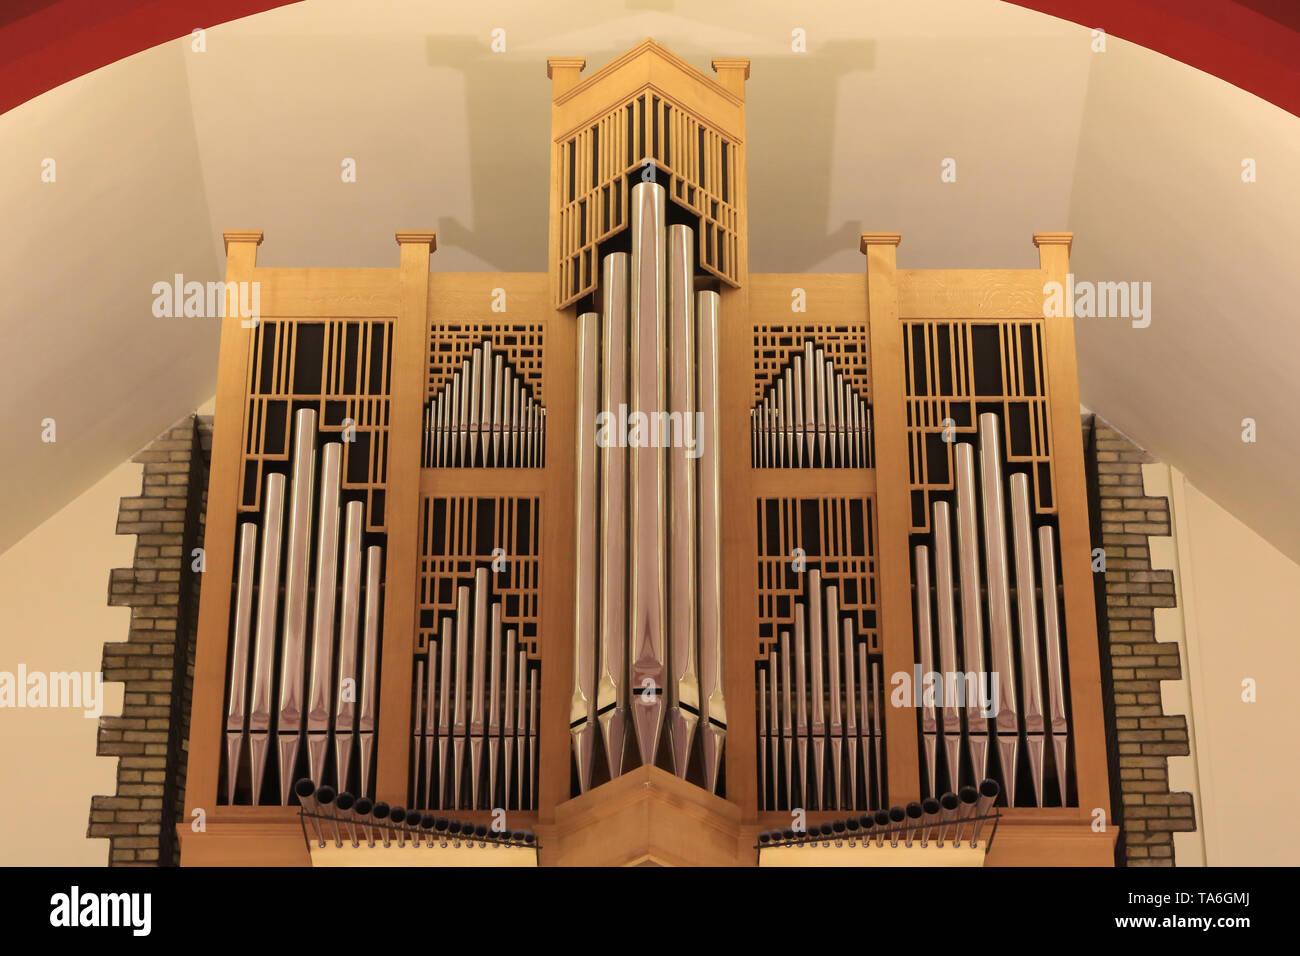 Orgue. Eglise Notre-Dame de Lourdes. Chaville. Orgel. Kirche Unserer Lieben Frau von Lourdes. Chaville. Stockbild